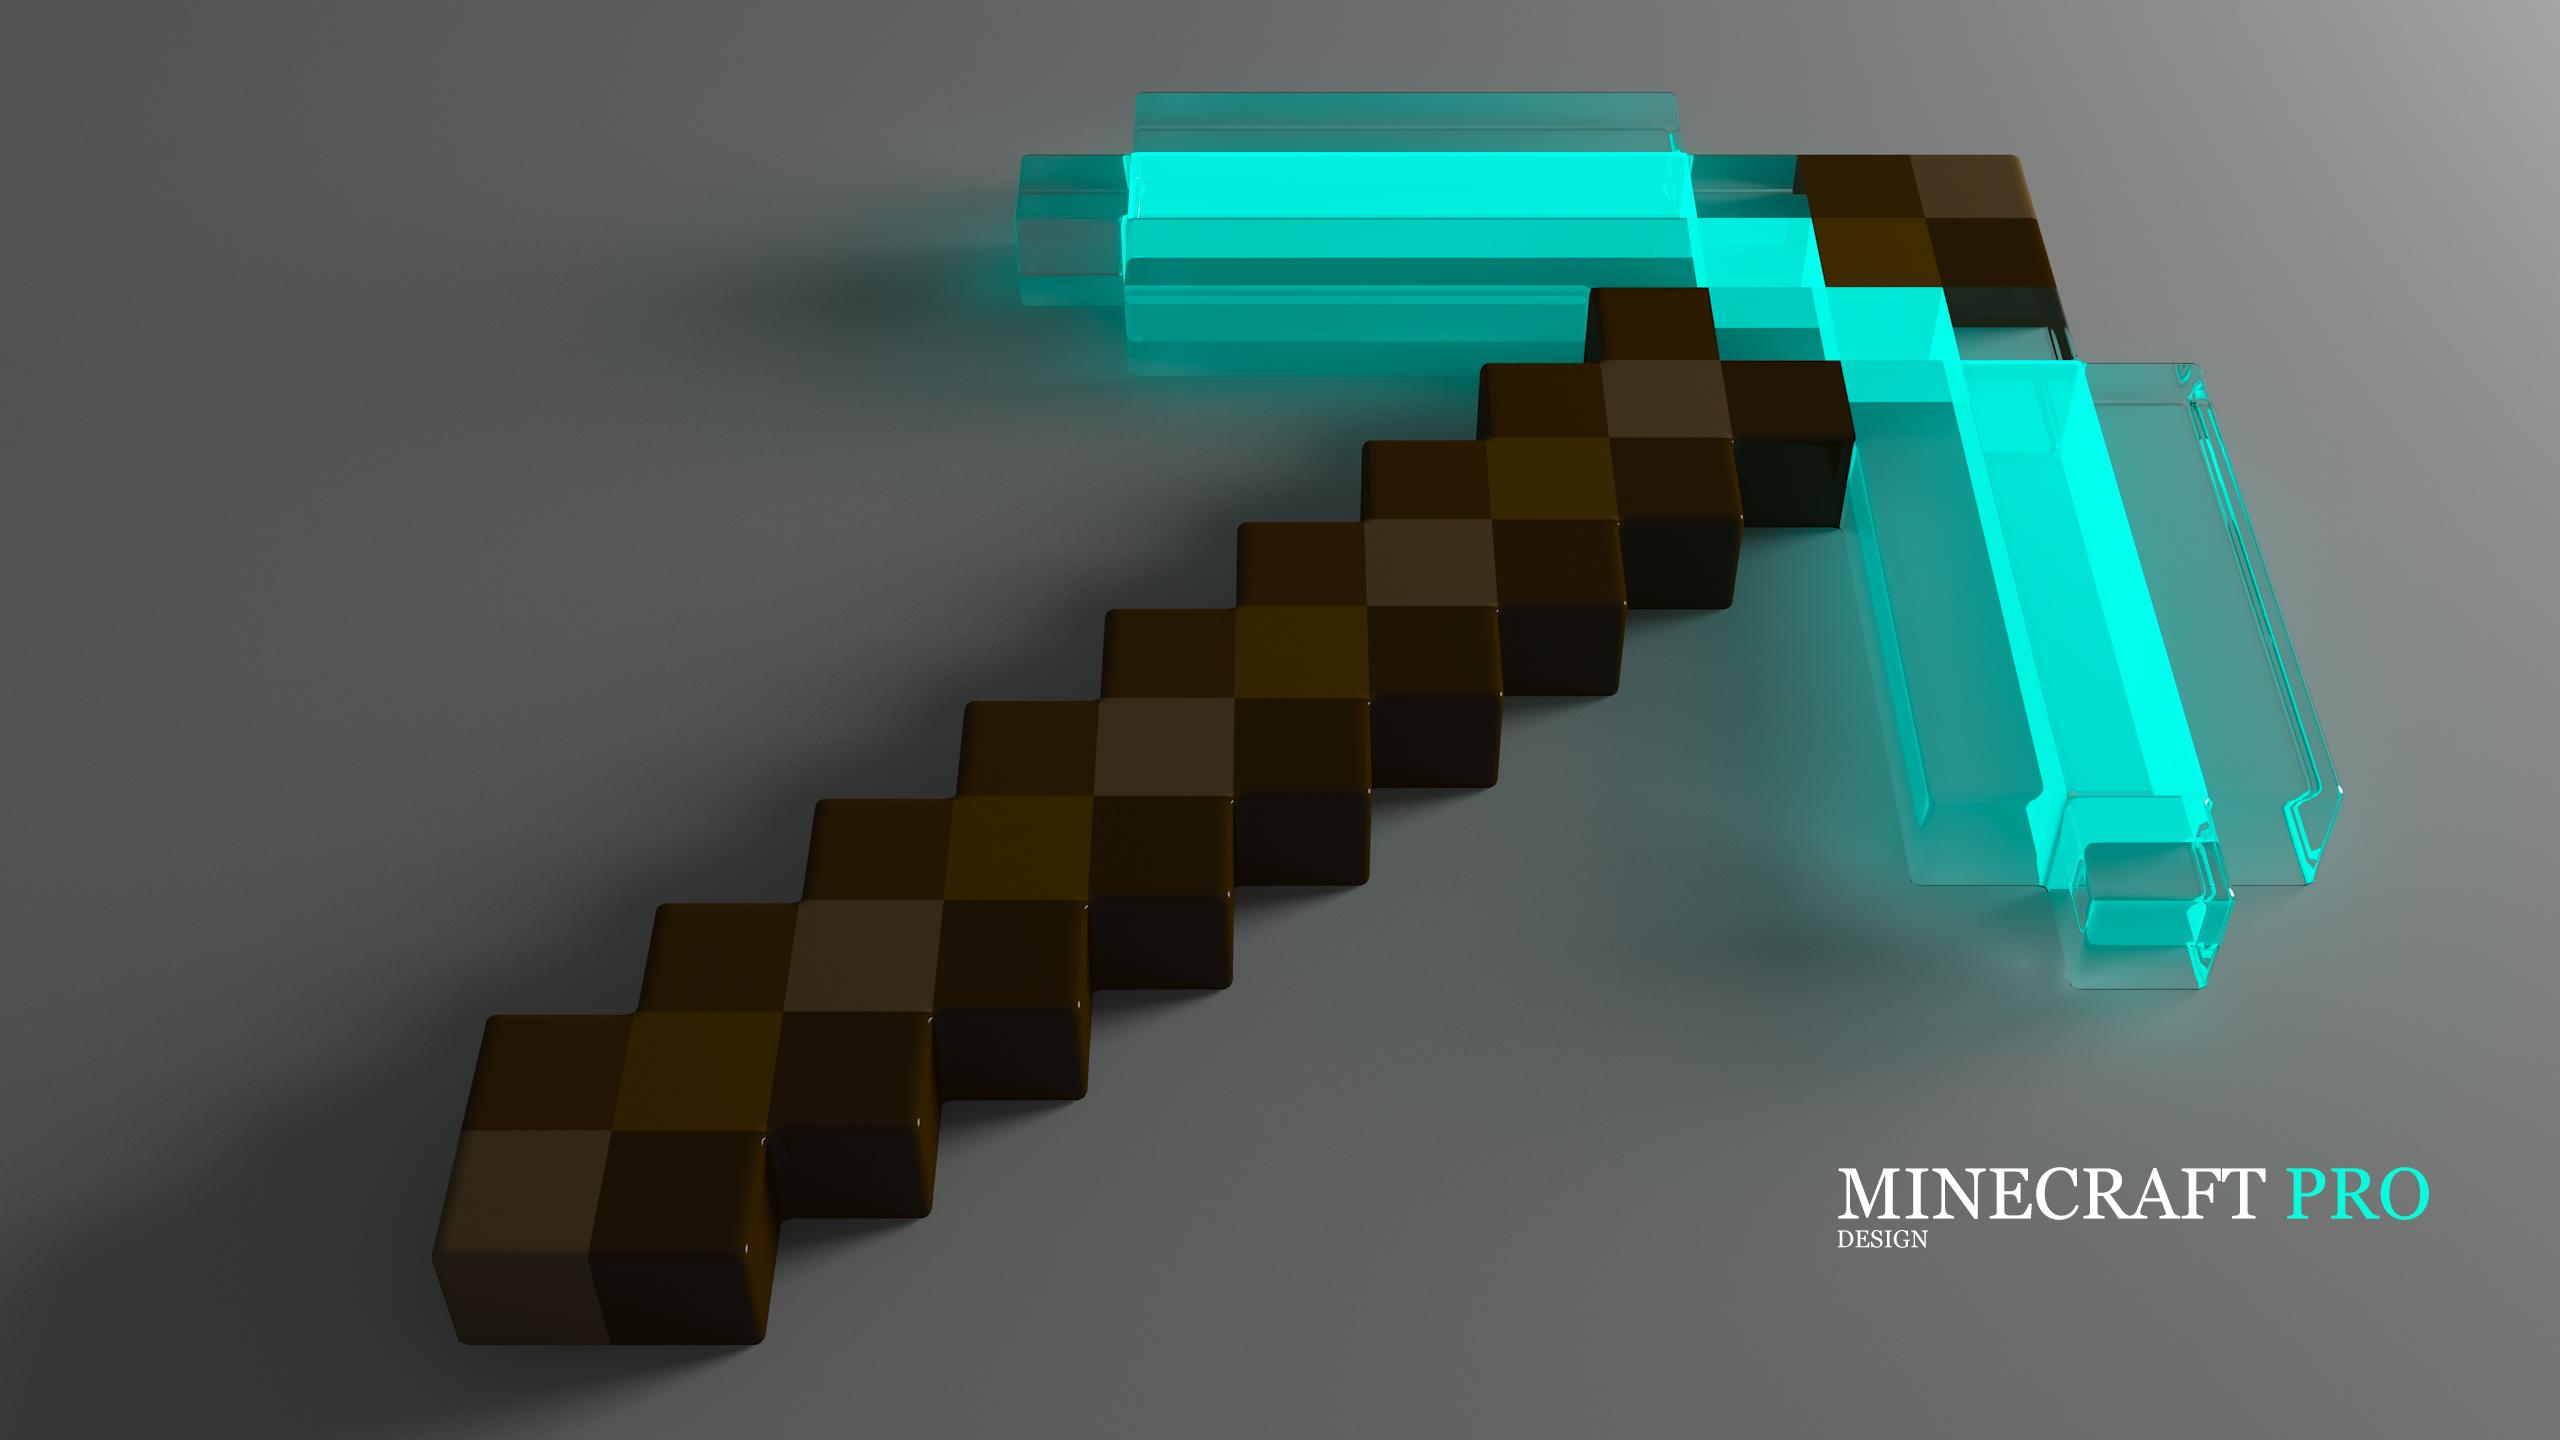 Minecraft Pick Free Photo